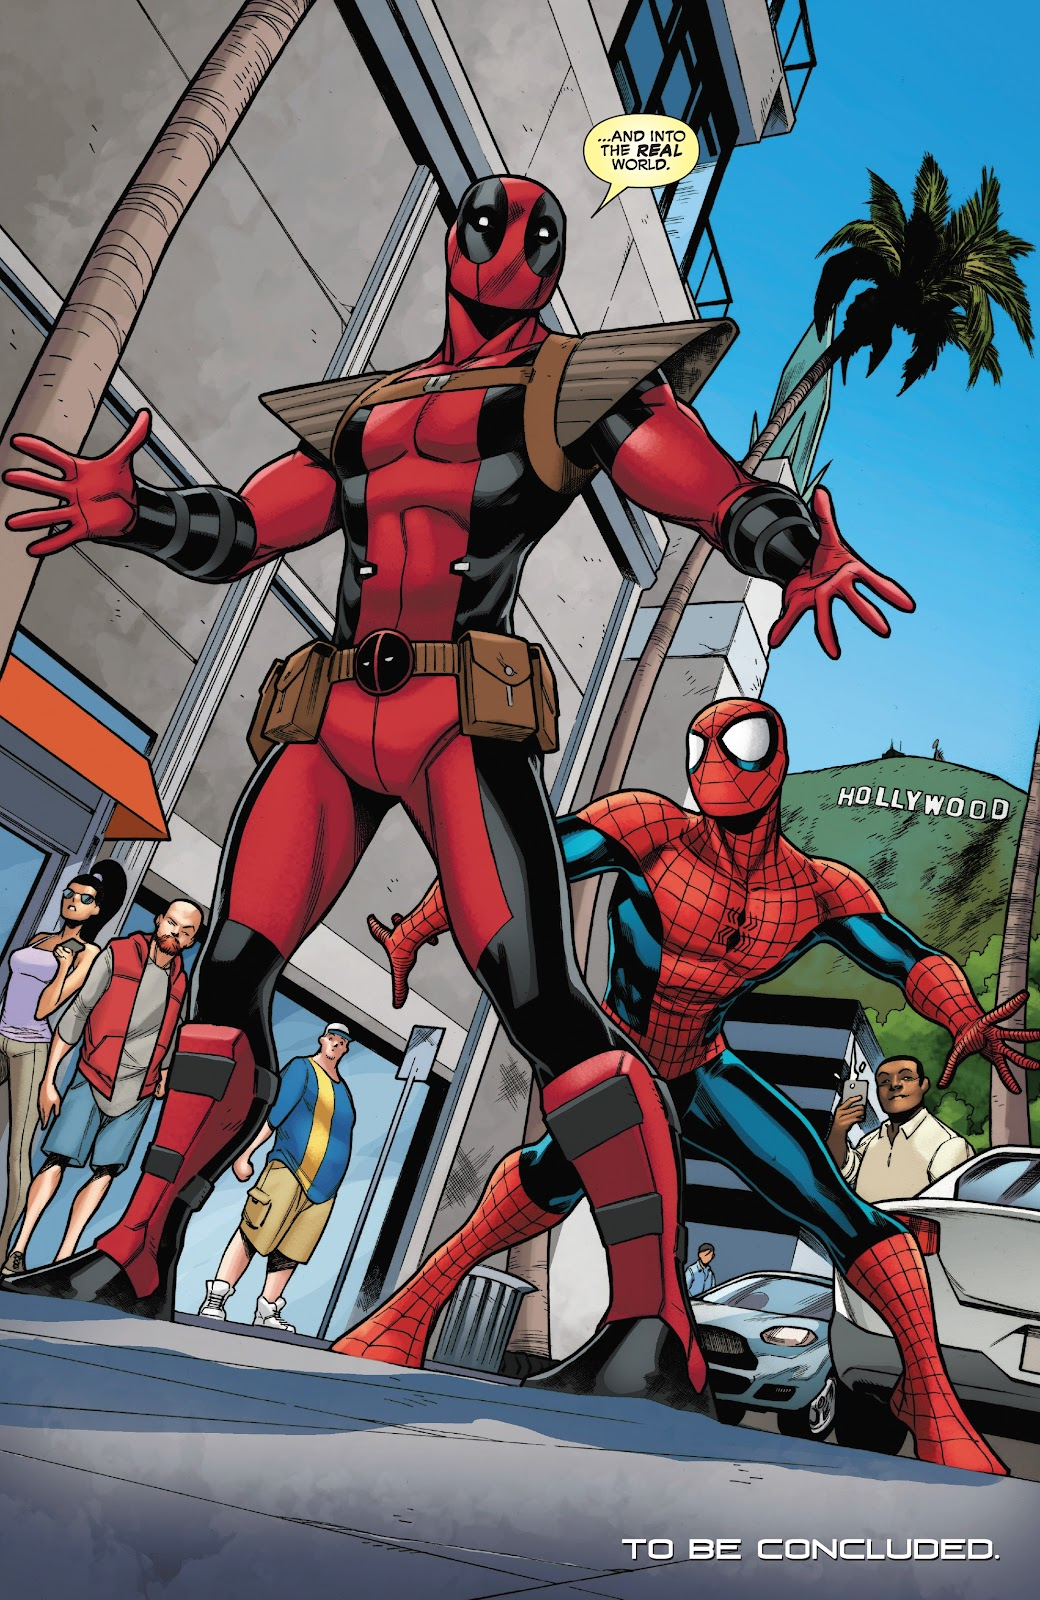 Read online Spider-Man/Deadpool comic -  Issue #49 - 22